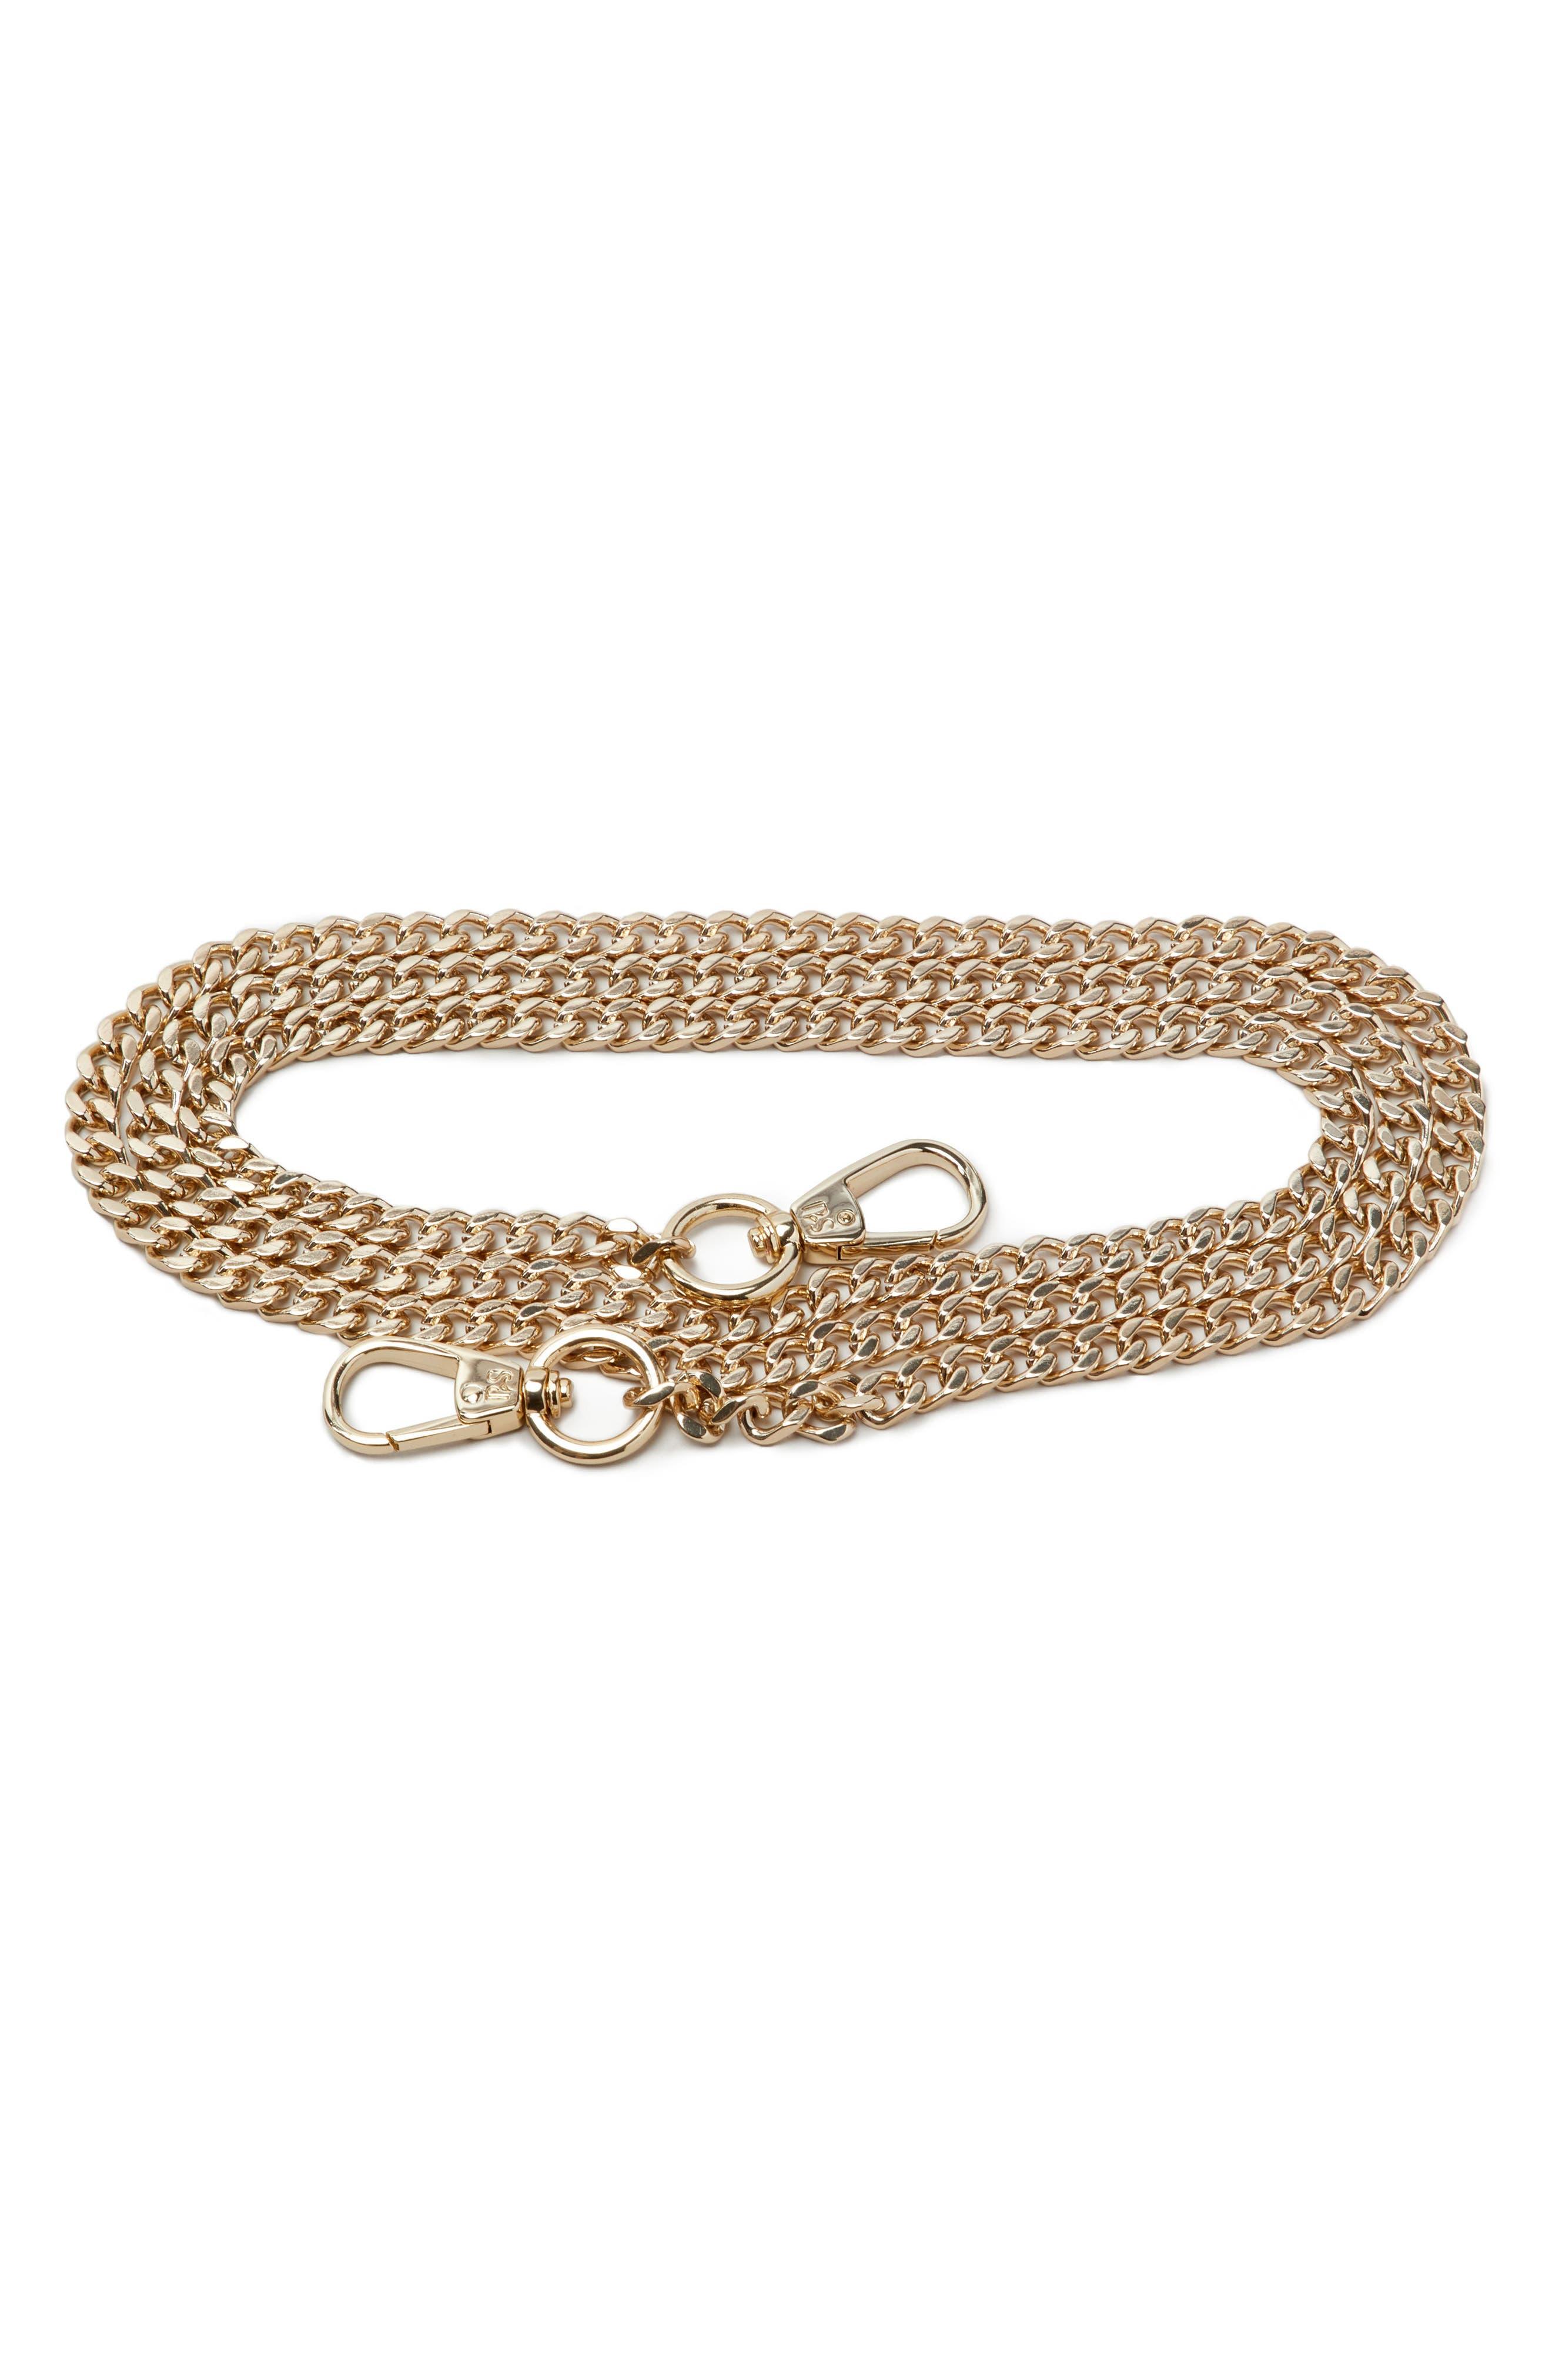 Chain Shoulder Strap,                         Main,                         color, Gold